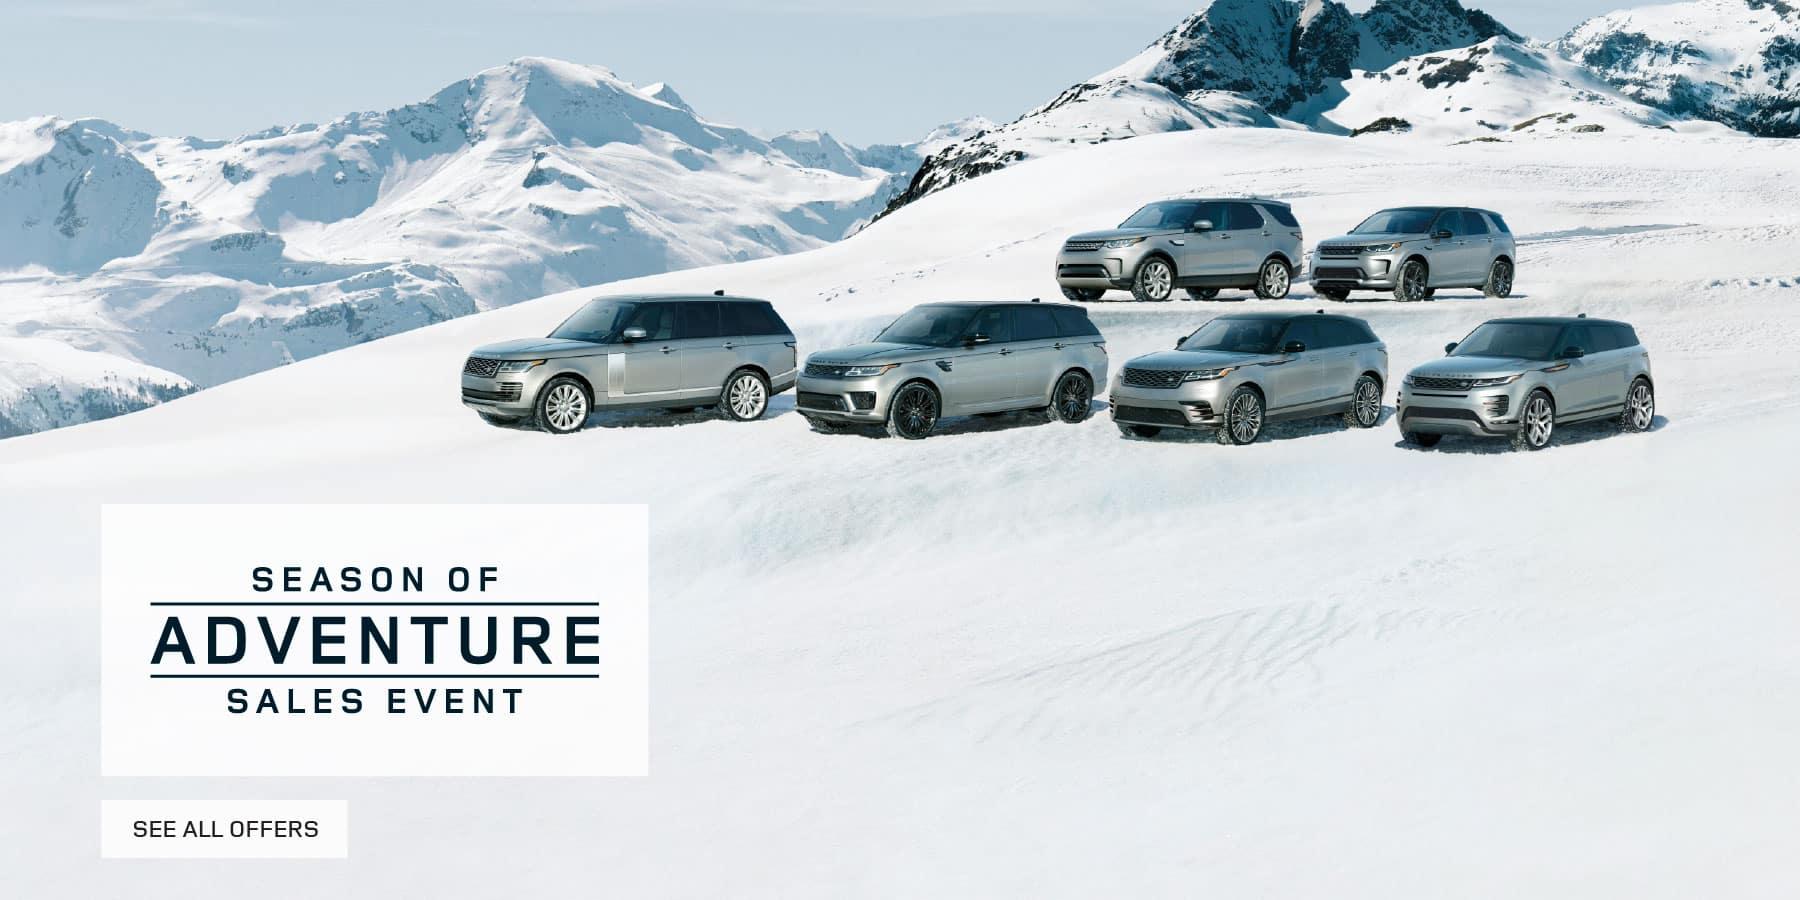 Autobahn Land Rover Fort Worth | Season of Adventure Holiday Sale